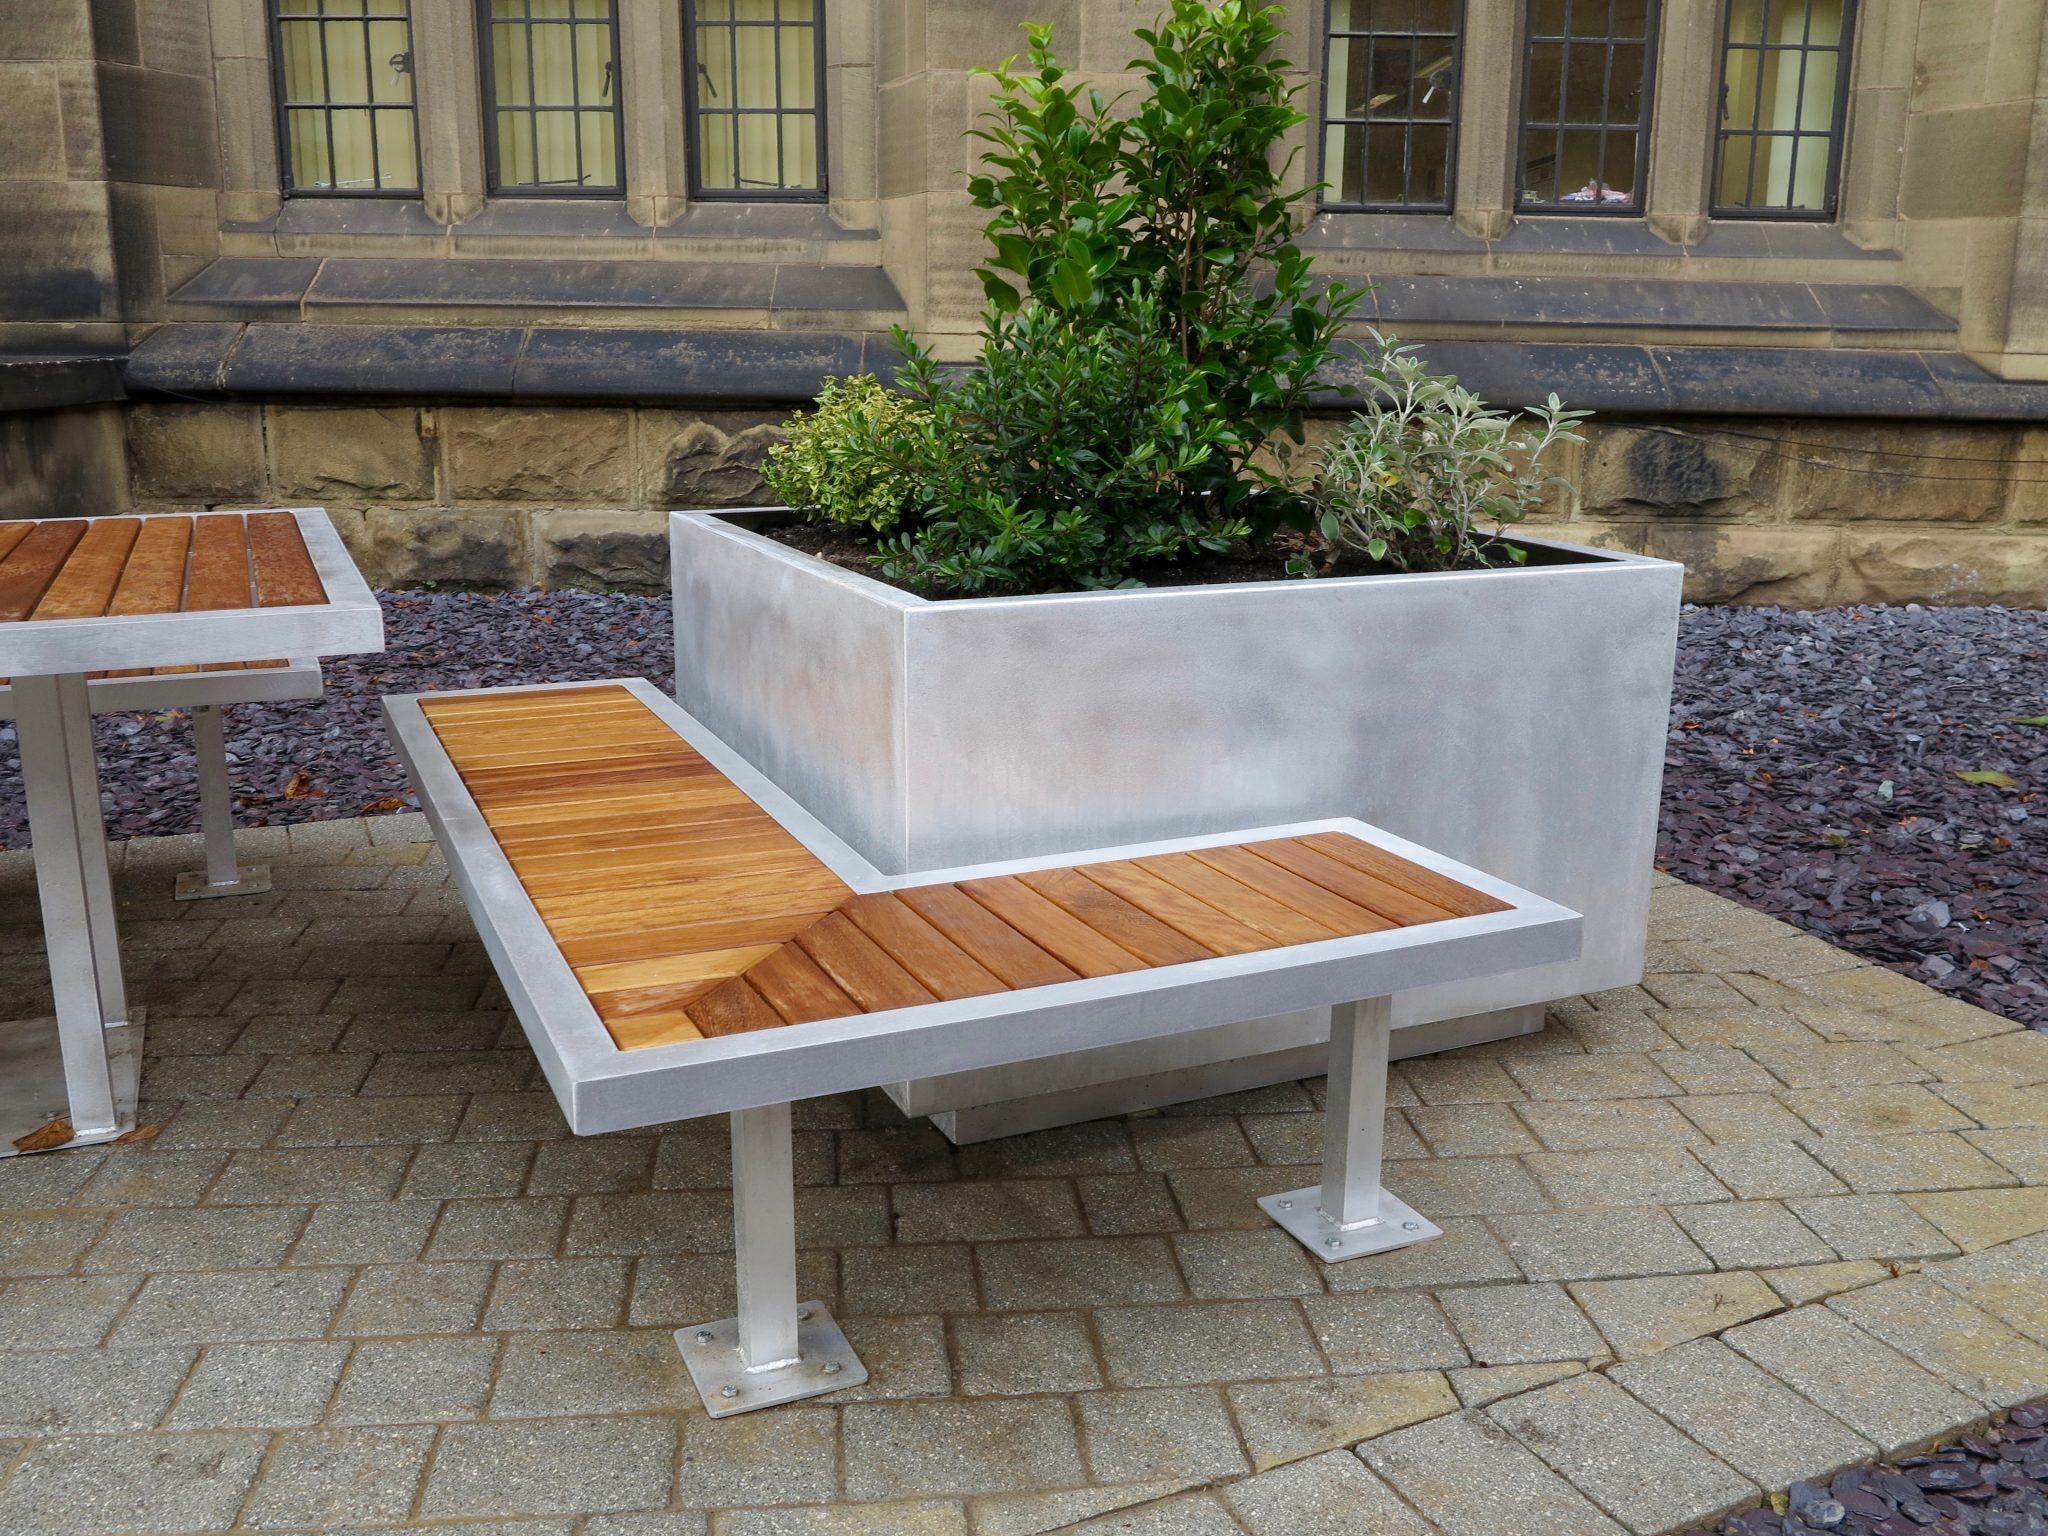 Benchmark Design   Campus Range   Street Furniture   Birmingham Uni   Bench